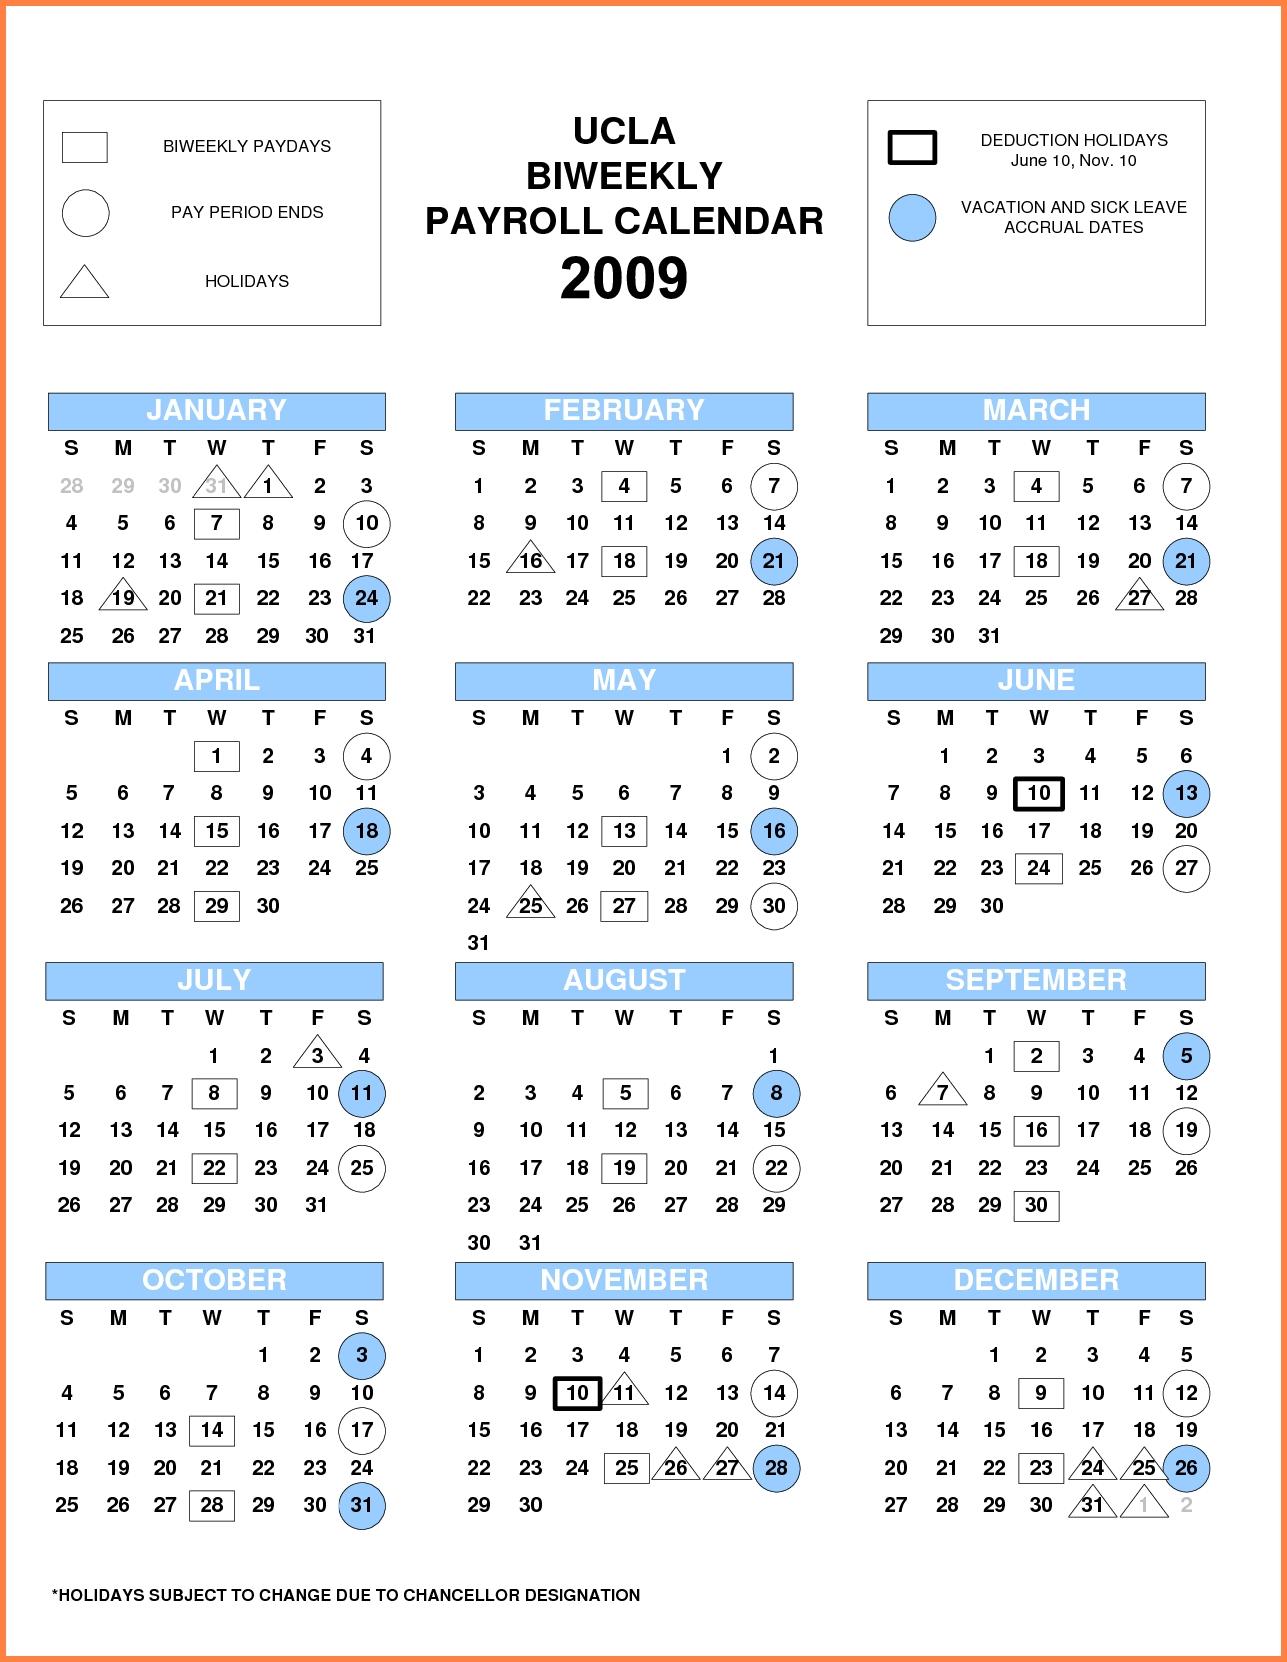 Ucla 2019 Biweekly Payroll Calendar | Payroll Calendars-Biweekly Payroll Schedule Template 2020